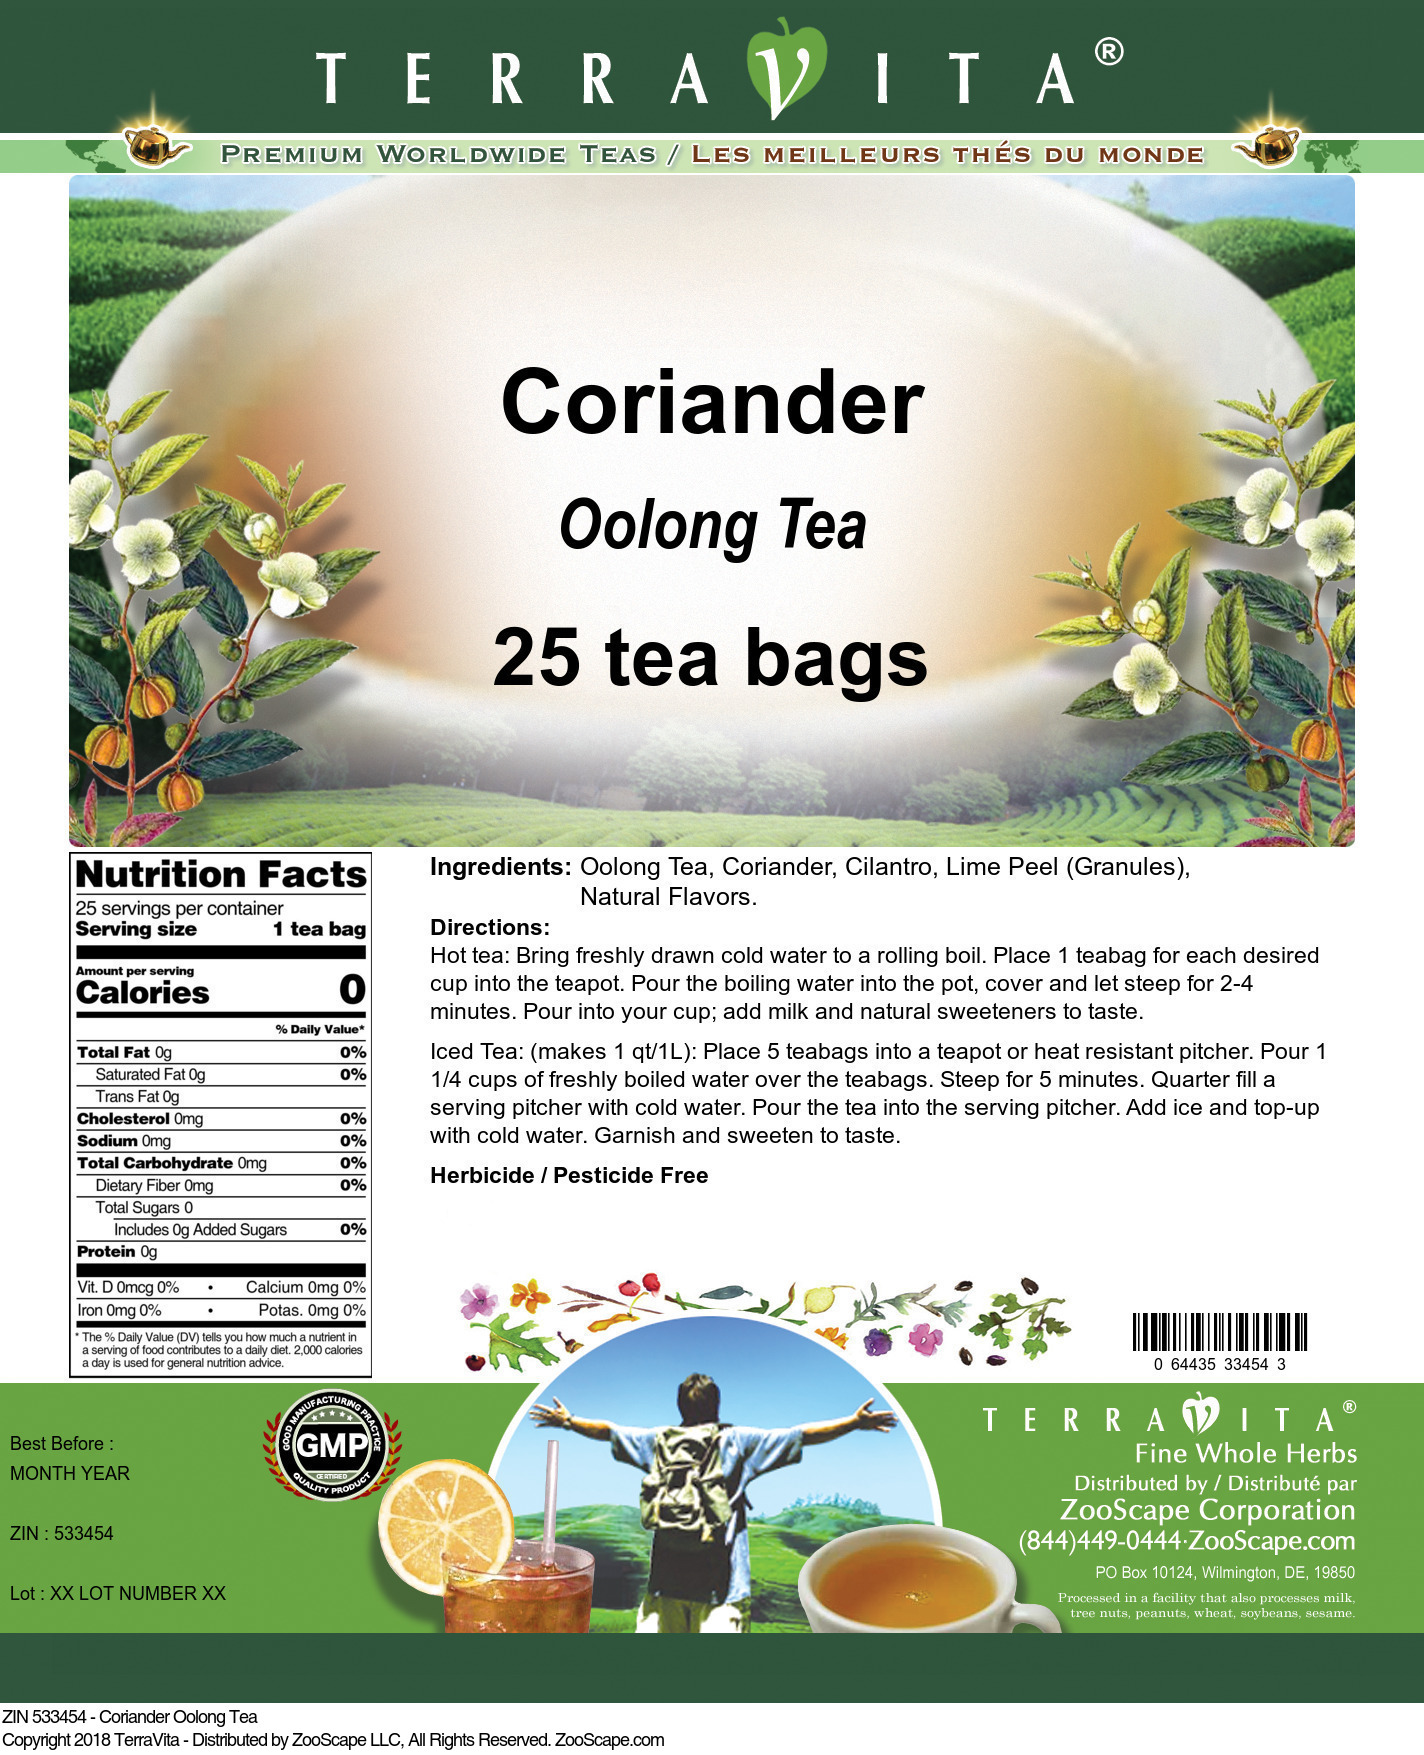 Coriander Oolong Tea